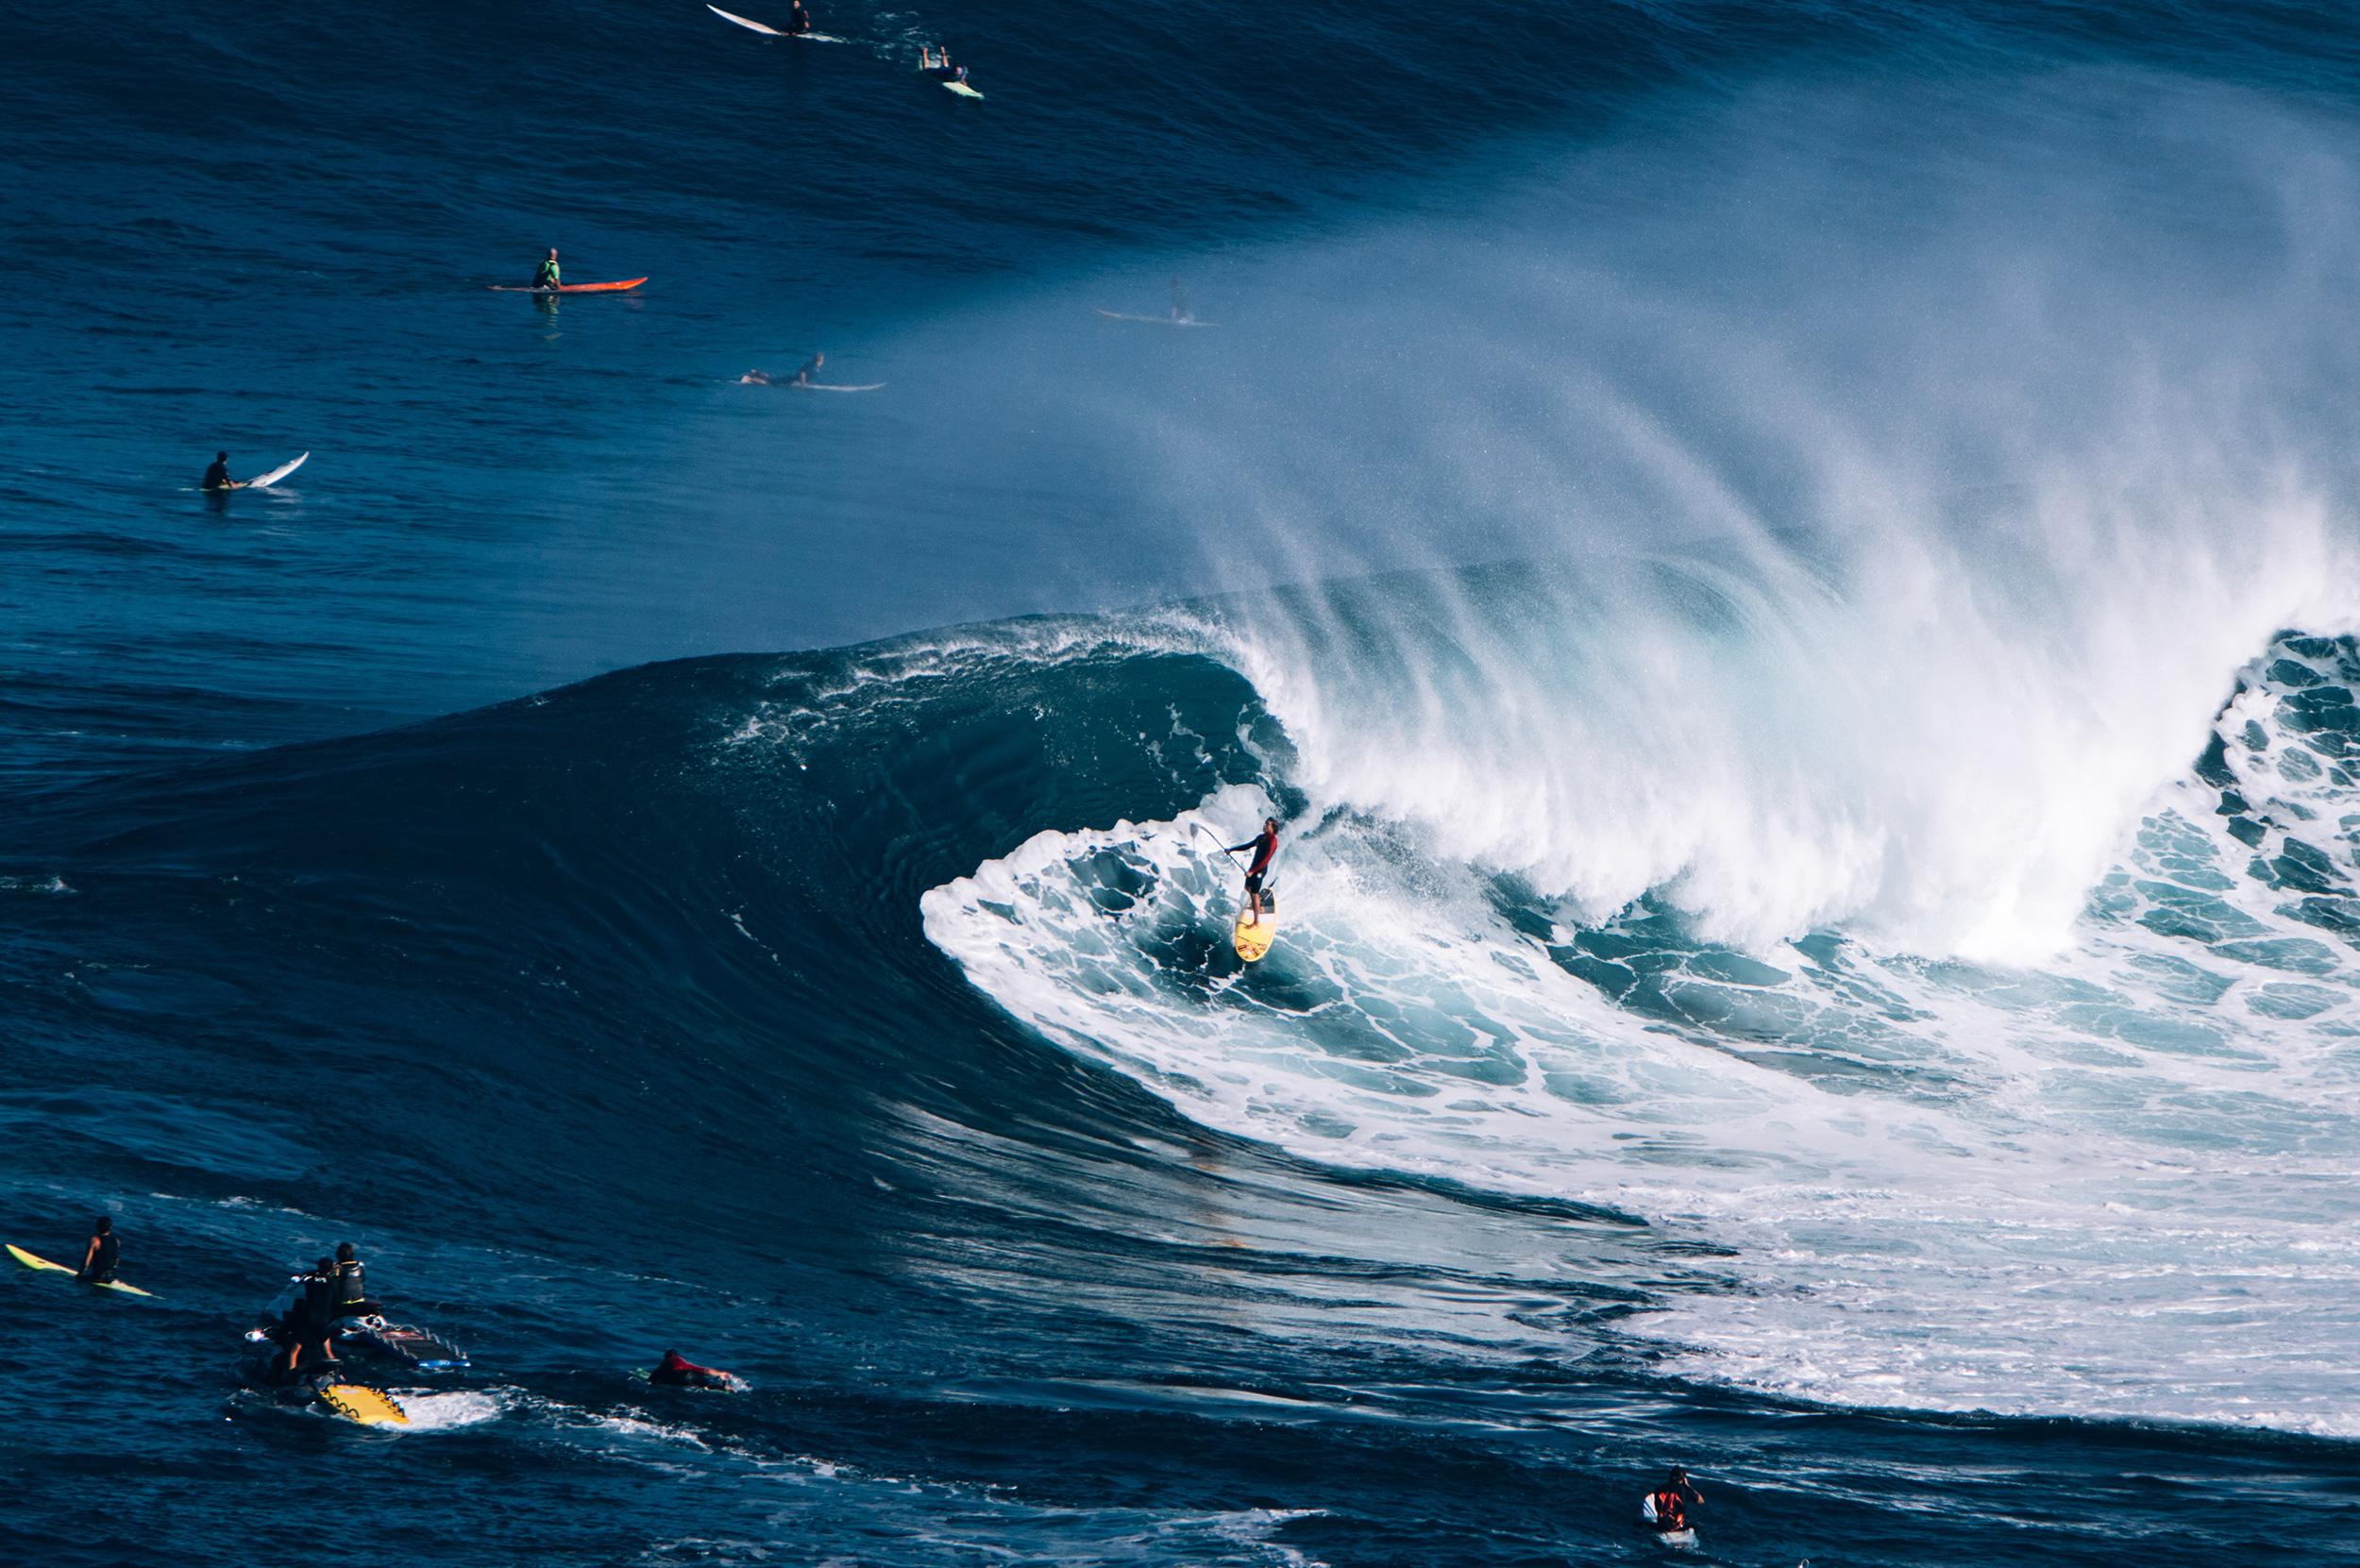 maui wave rider kai lenny jaws